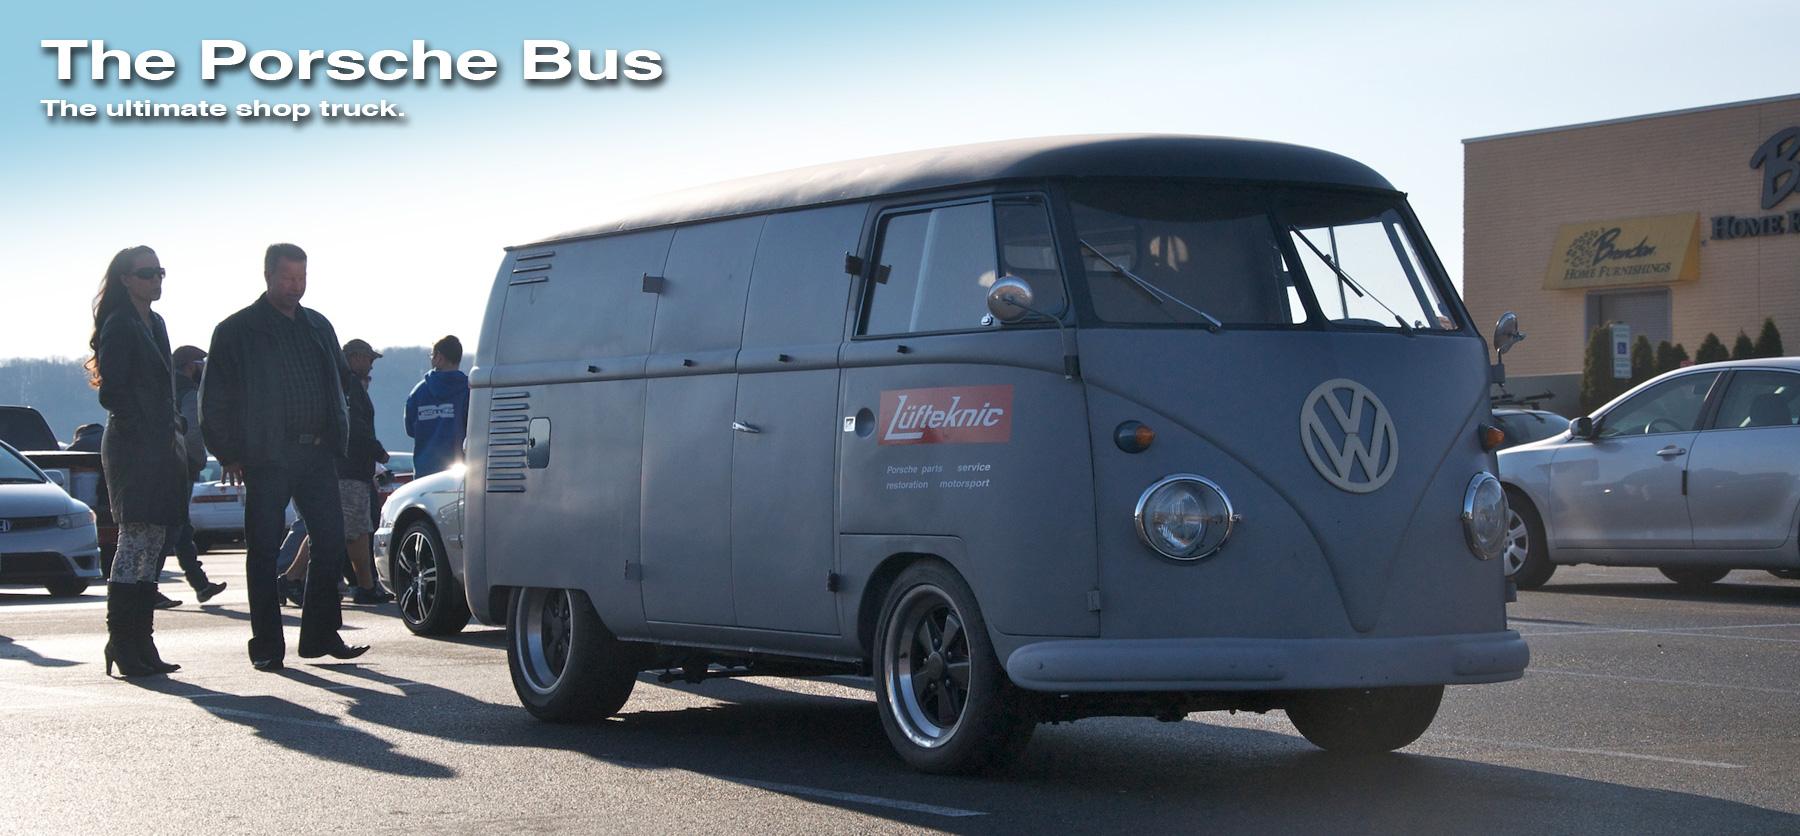 The Porsche bus slider image showing the porschebus in a parking lot.